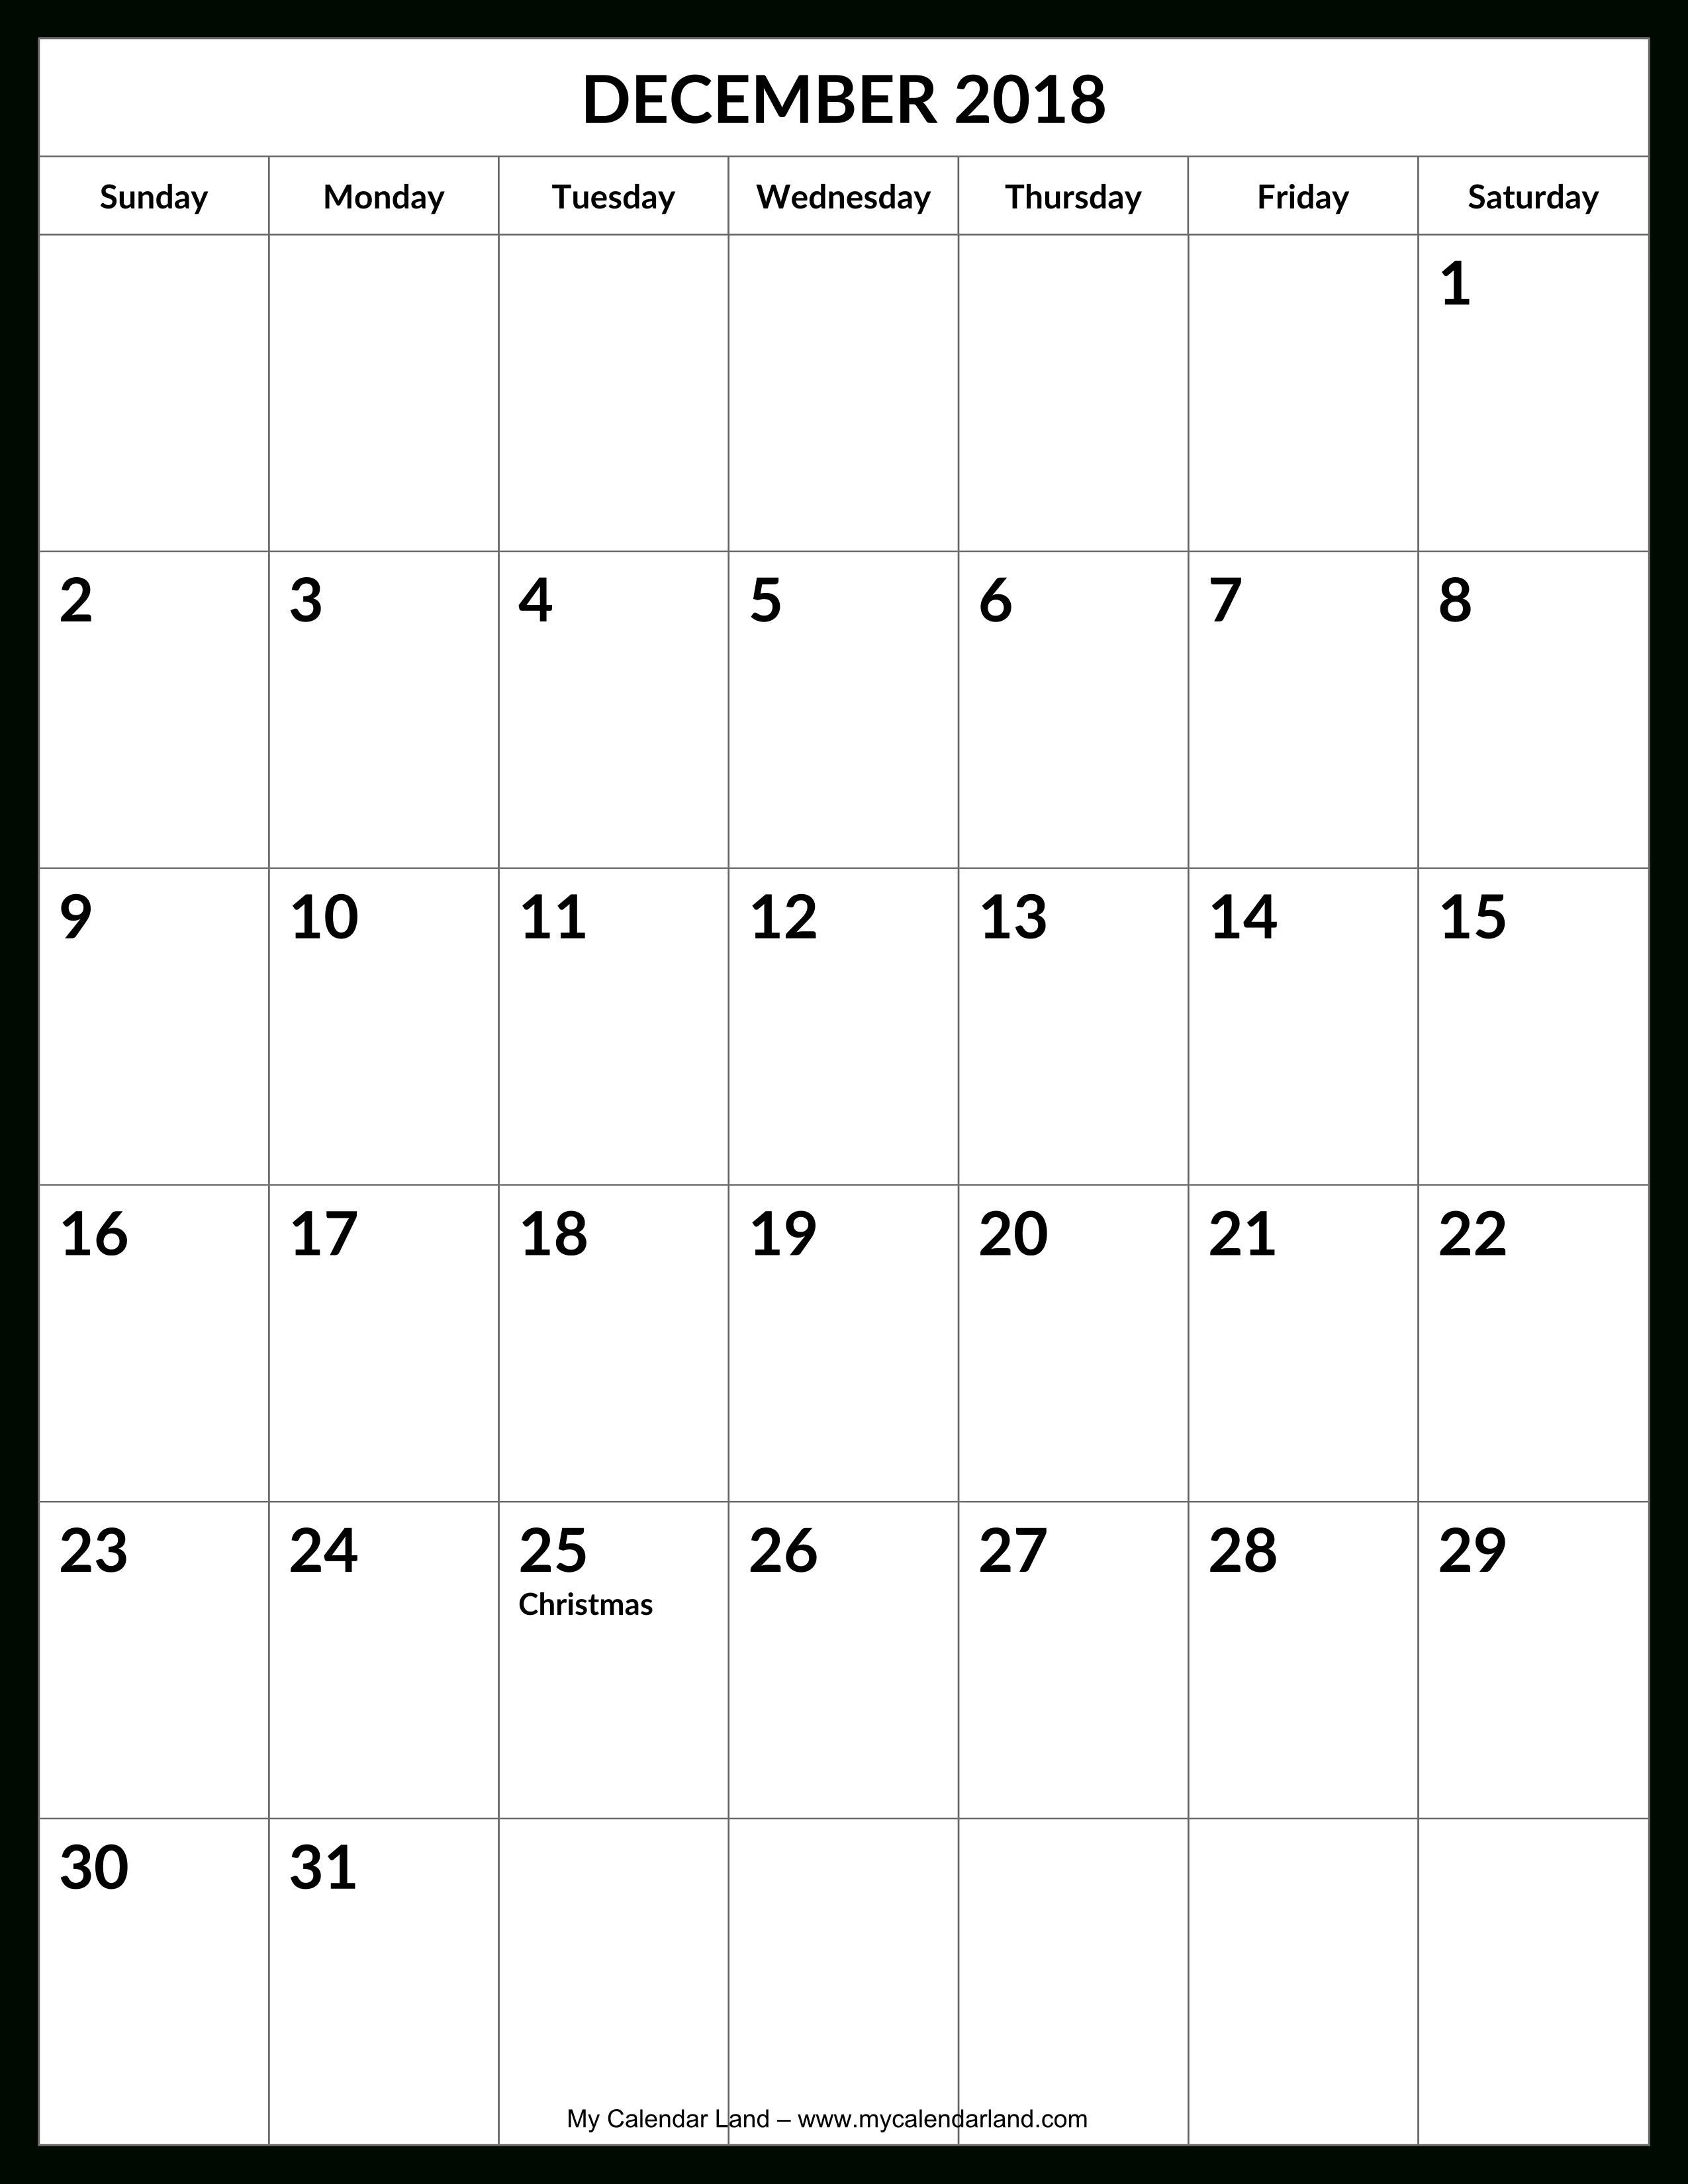 December 2018 Calendar - My Calendar Land